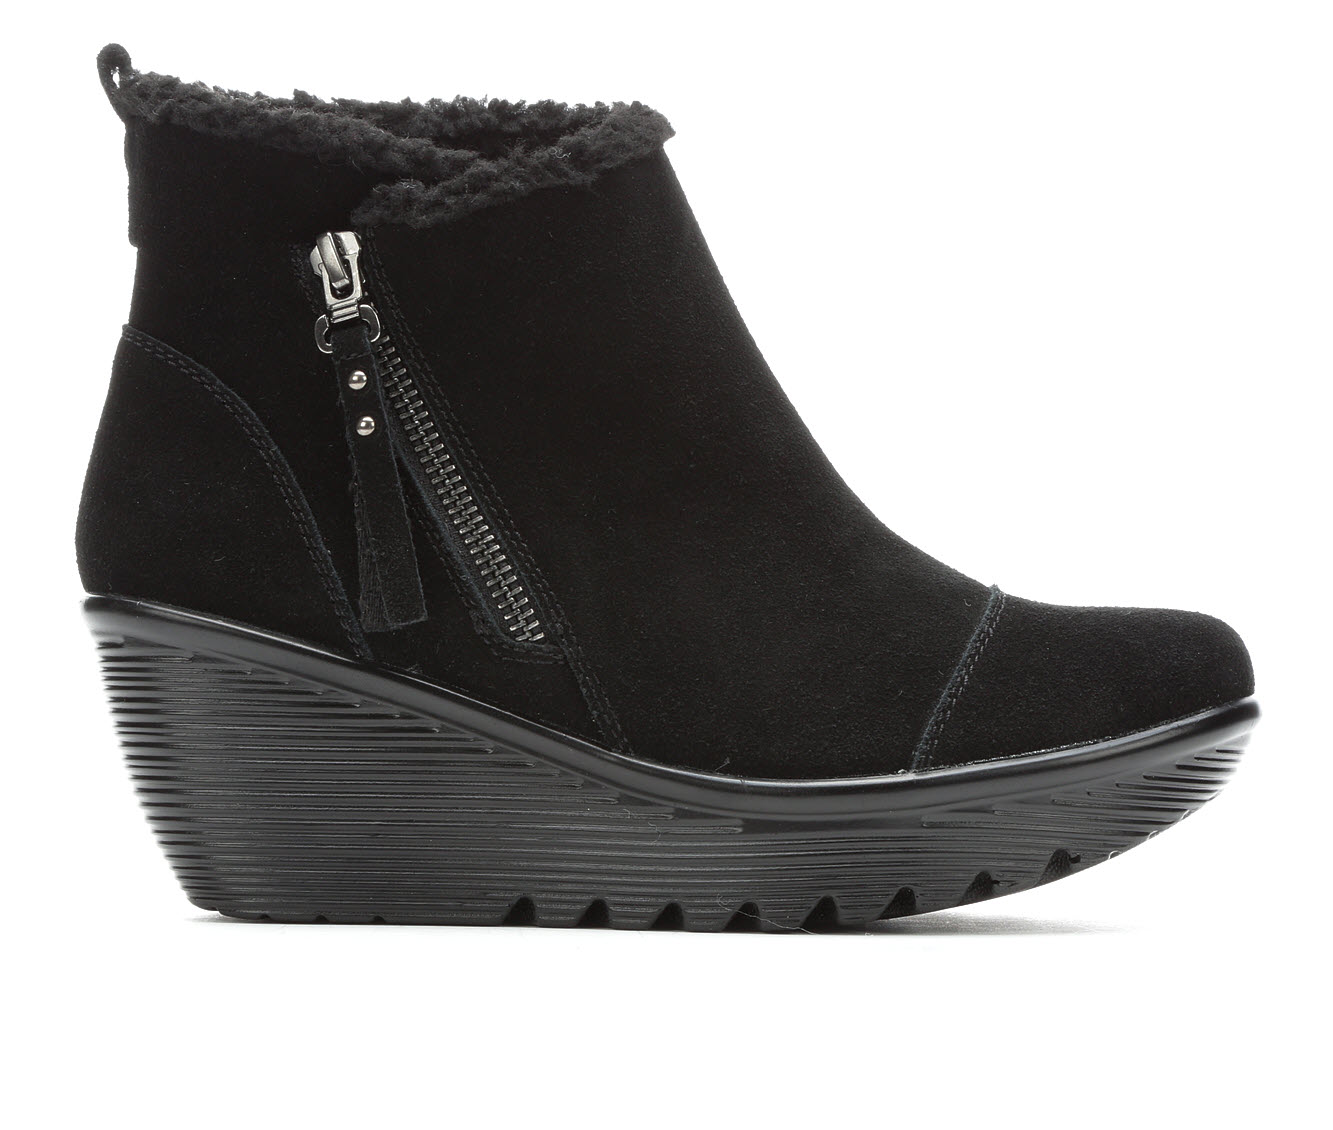 Skechers Parallel - Off Hours Women's Boot (Black Canvas)